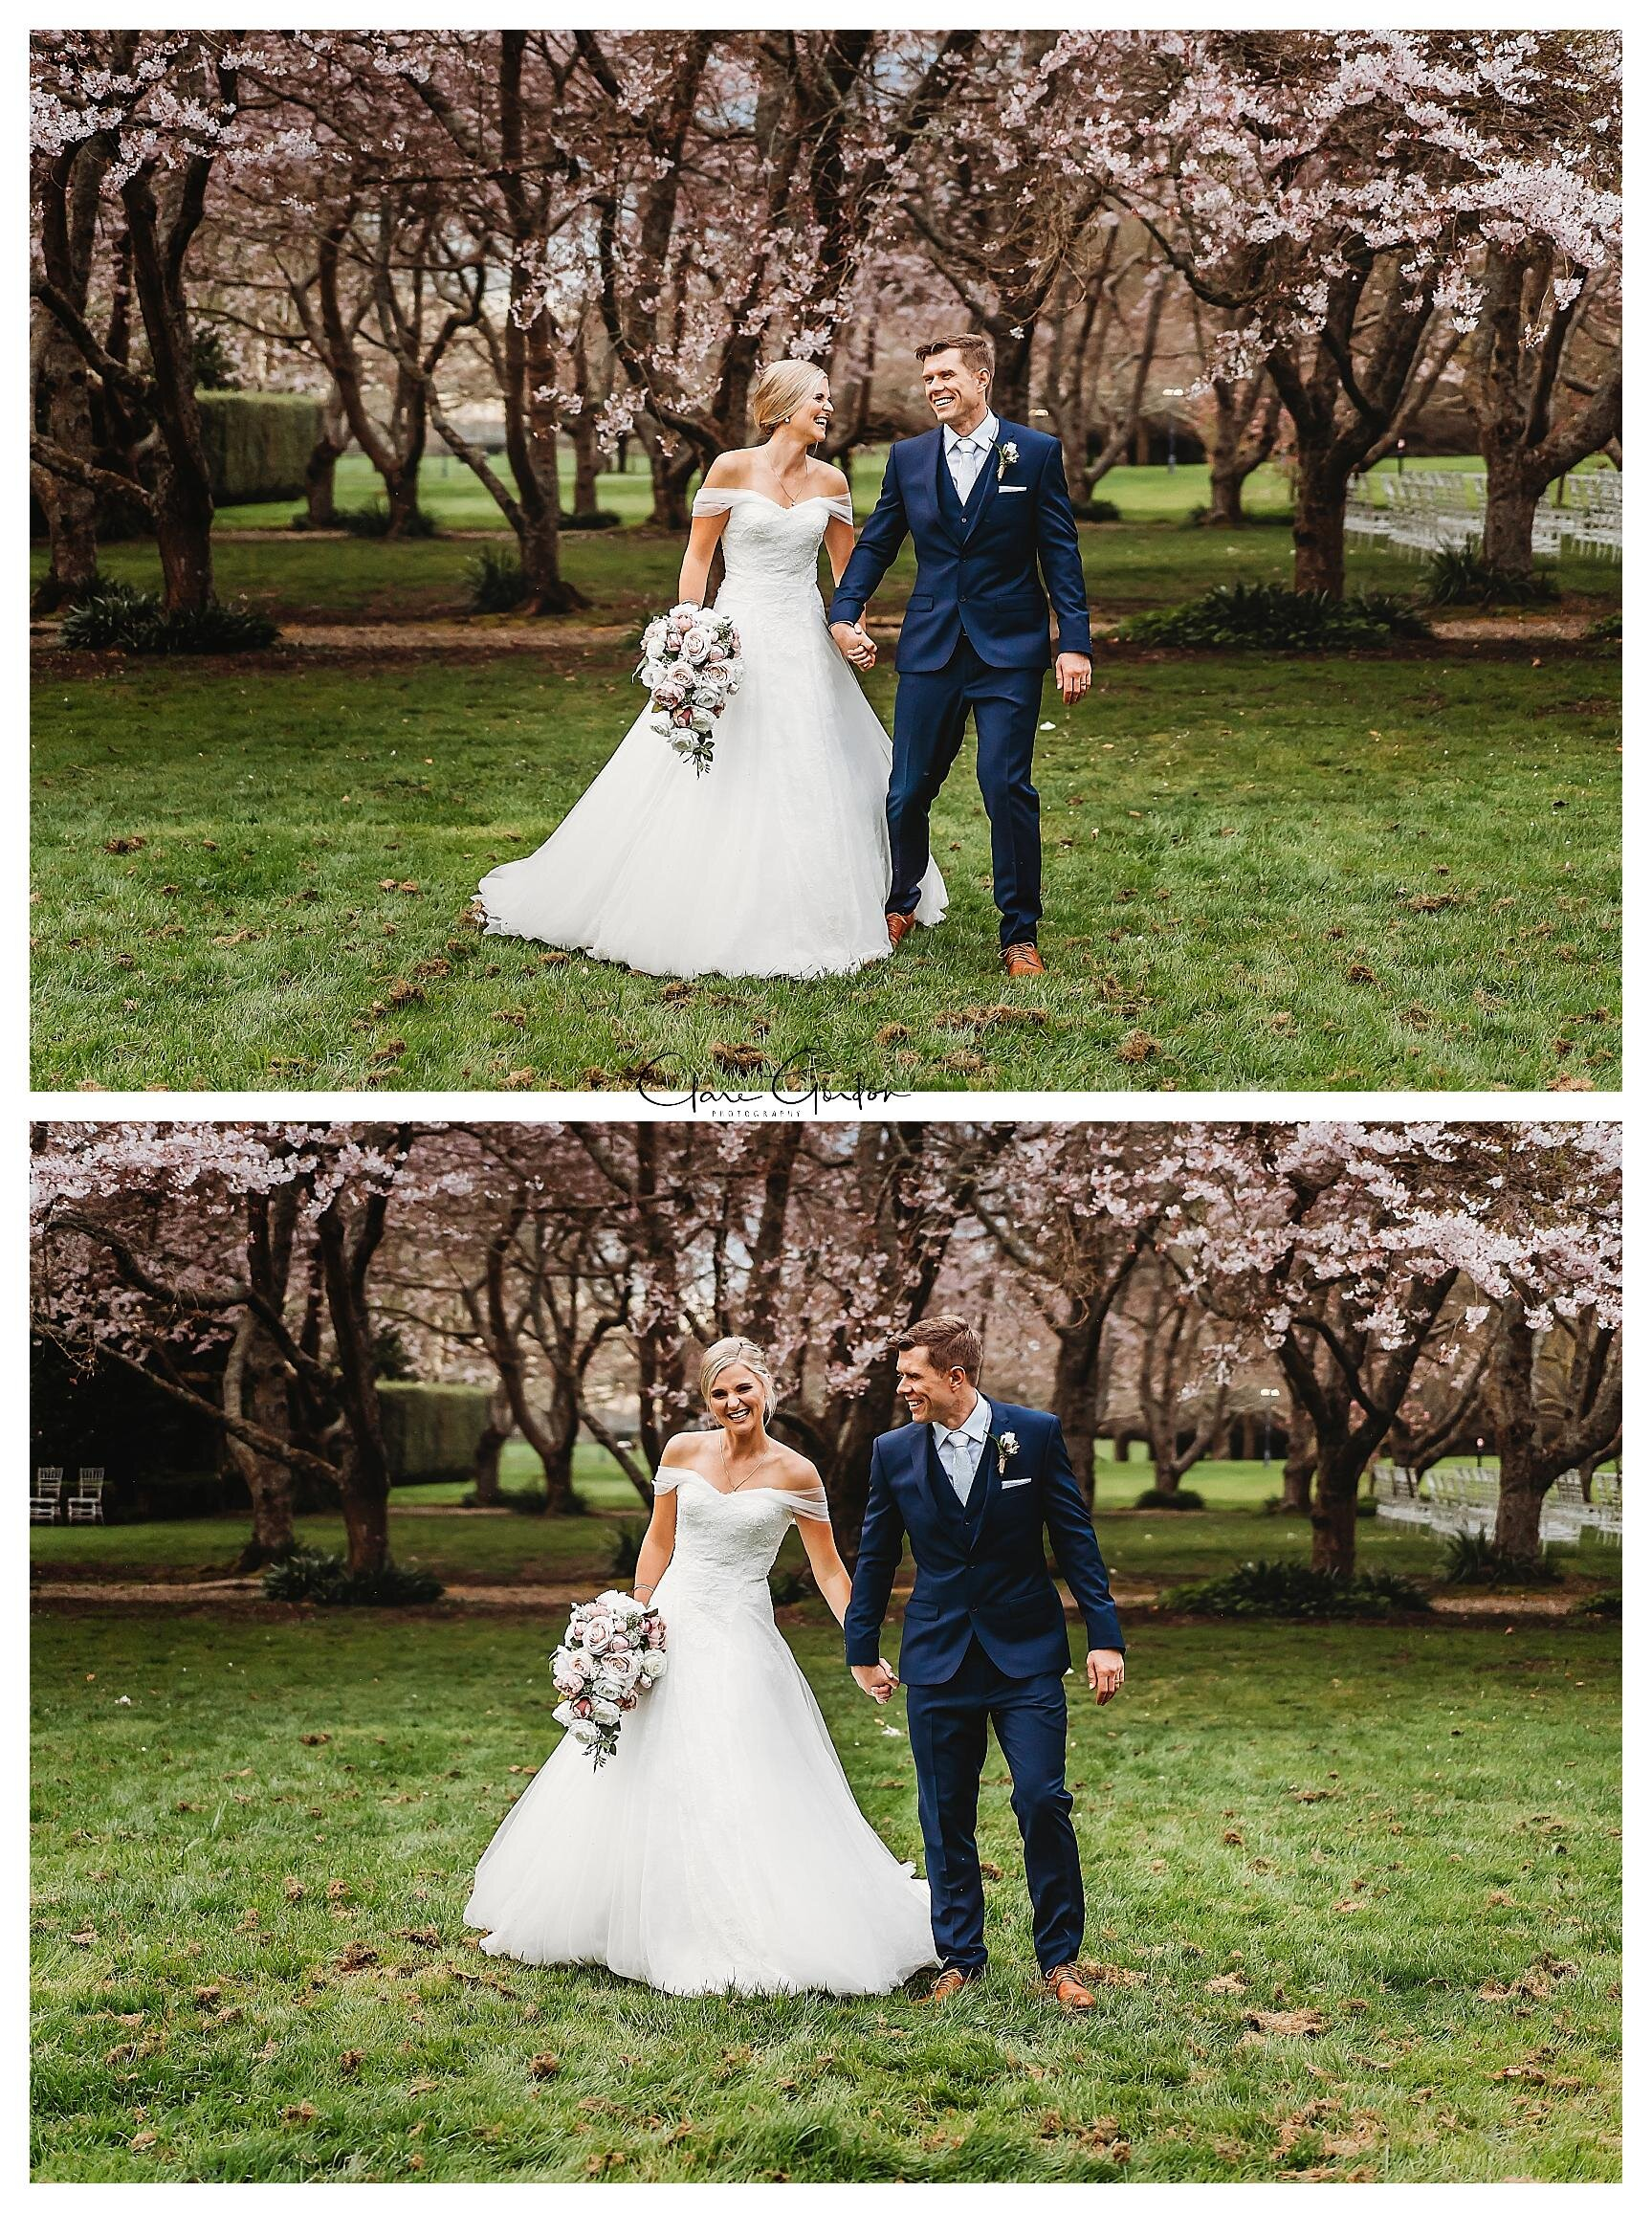 Henley-Hotel-Cherry-blossom-wedding-photos (67).jpg